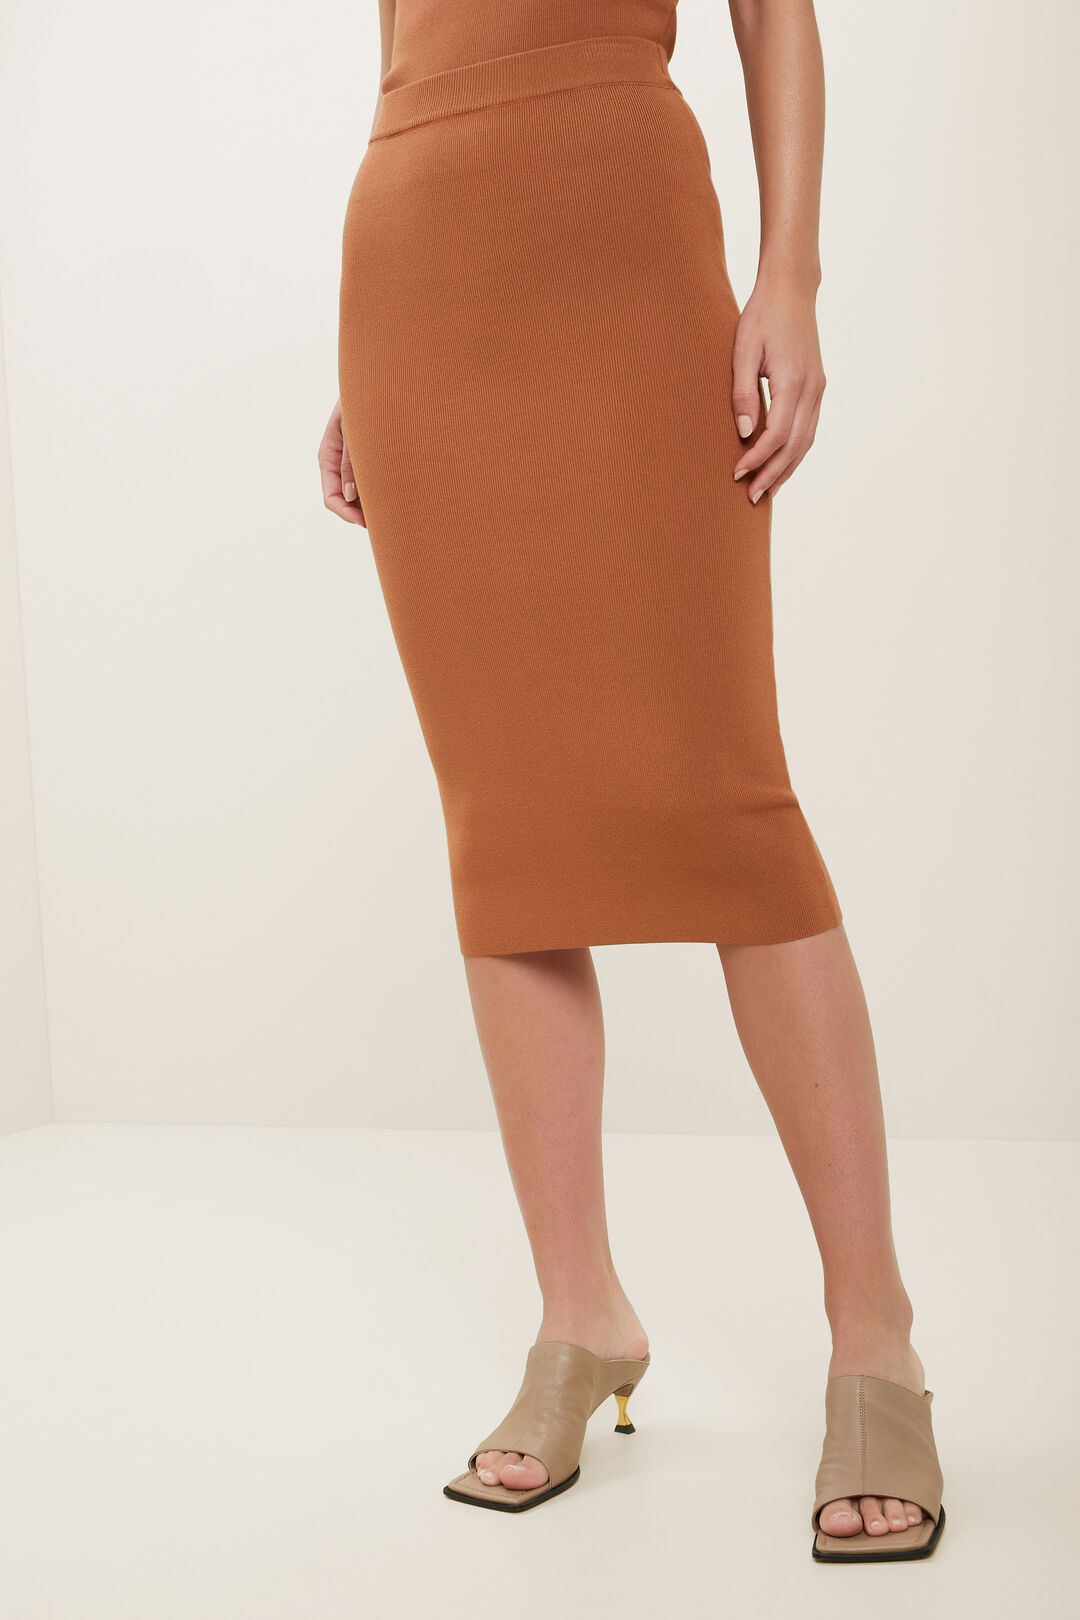 Crepe Knit Pencil Skirt  BURNT BRONZE  hi-res